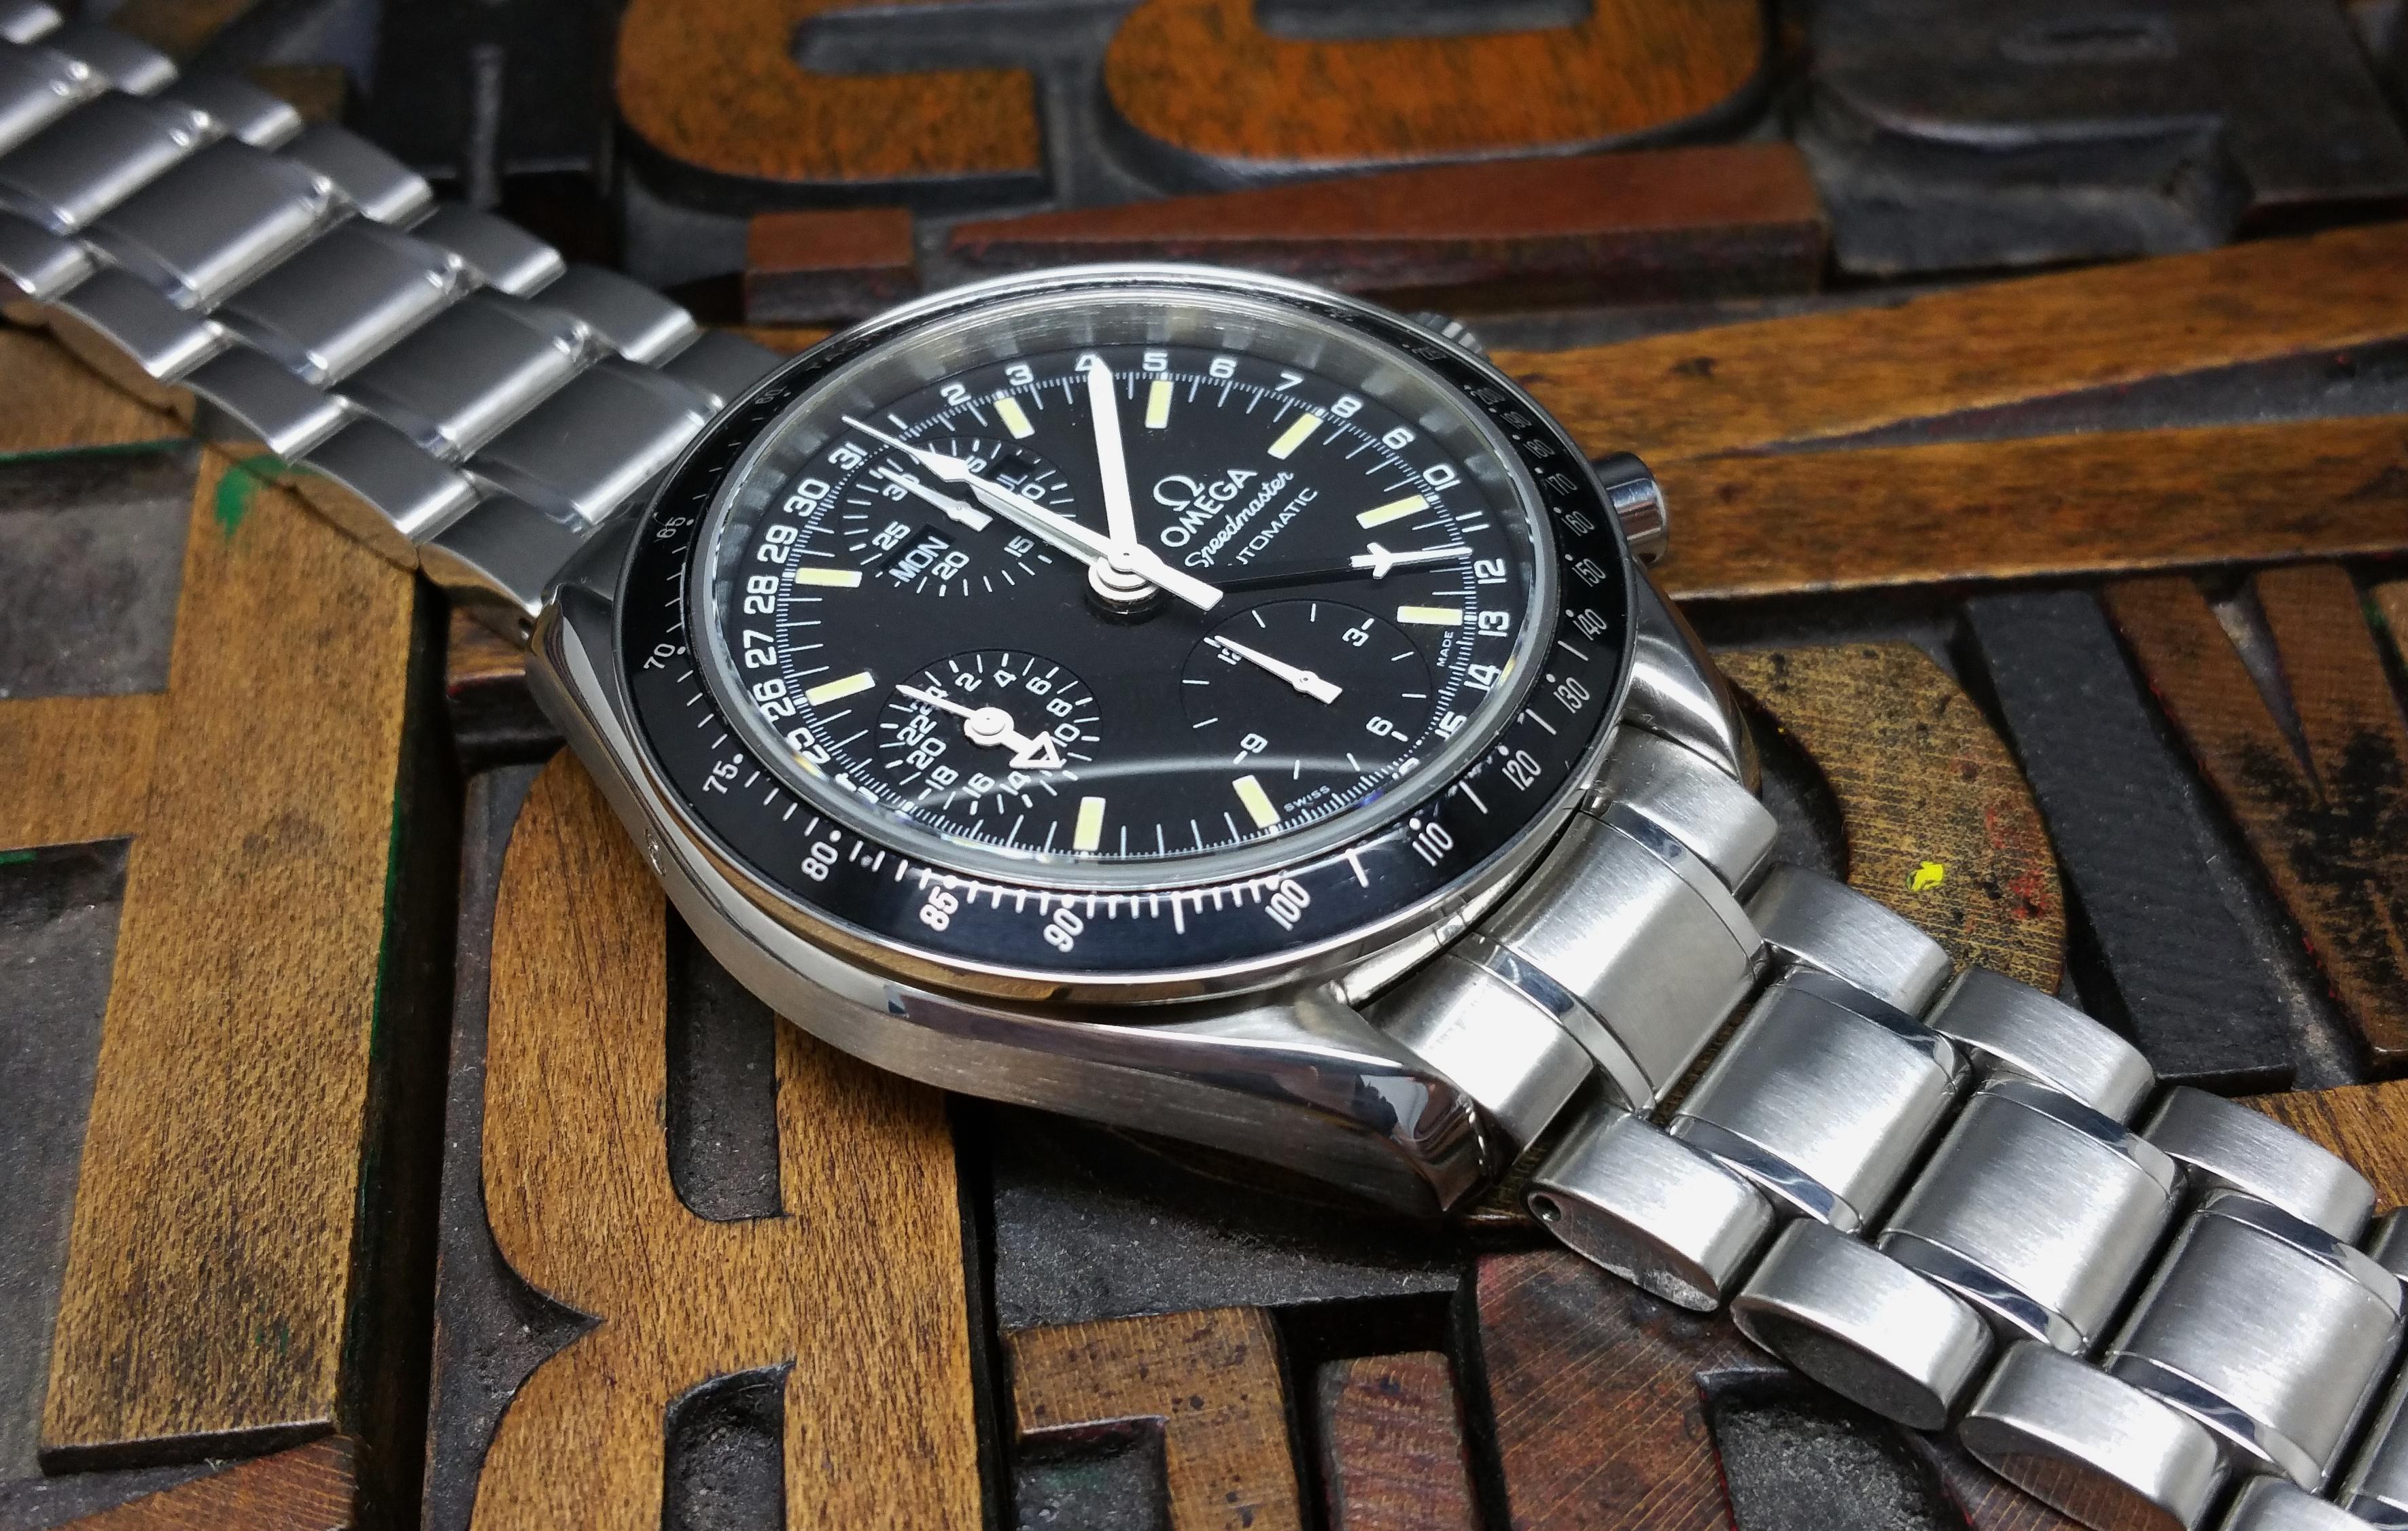 1999 Omega Speedmaster 3520.50.00 Triple Date Mark 40